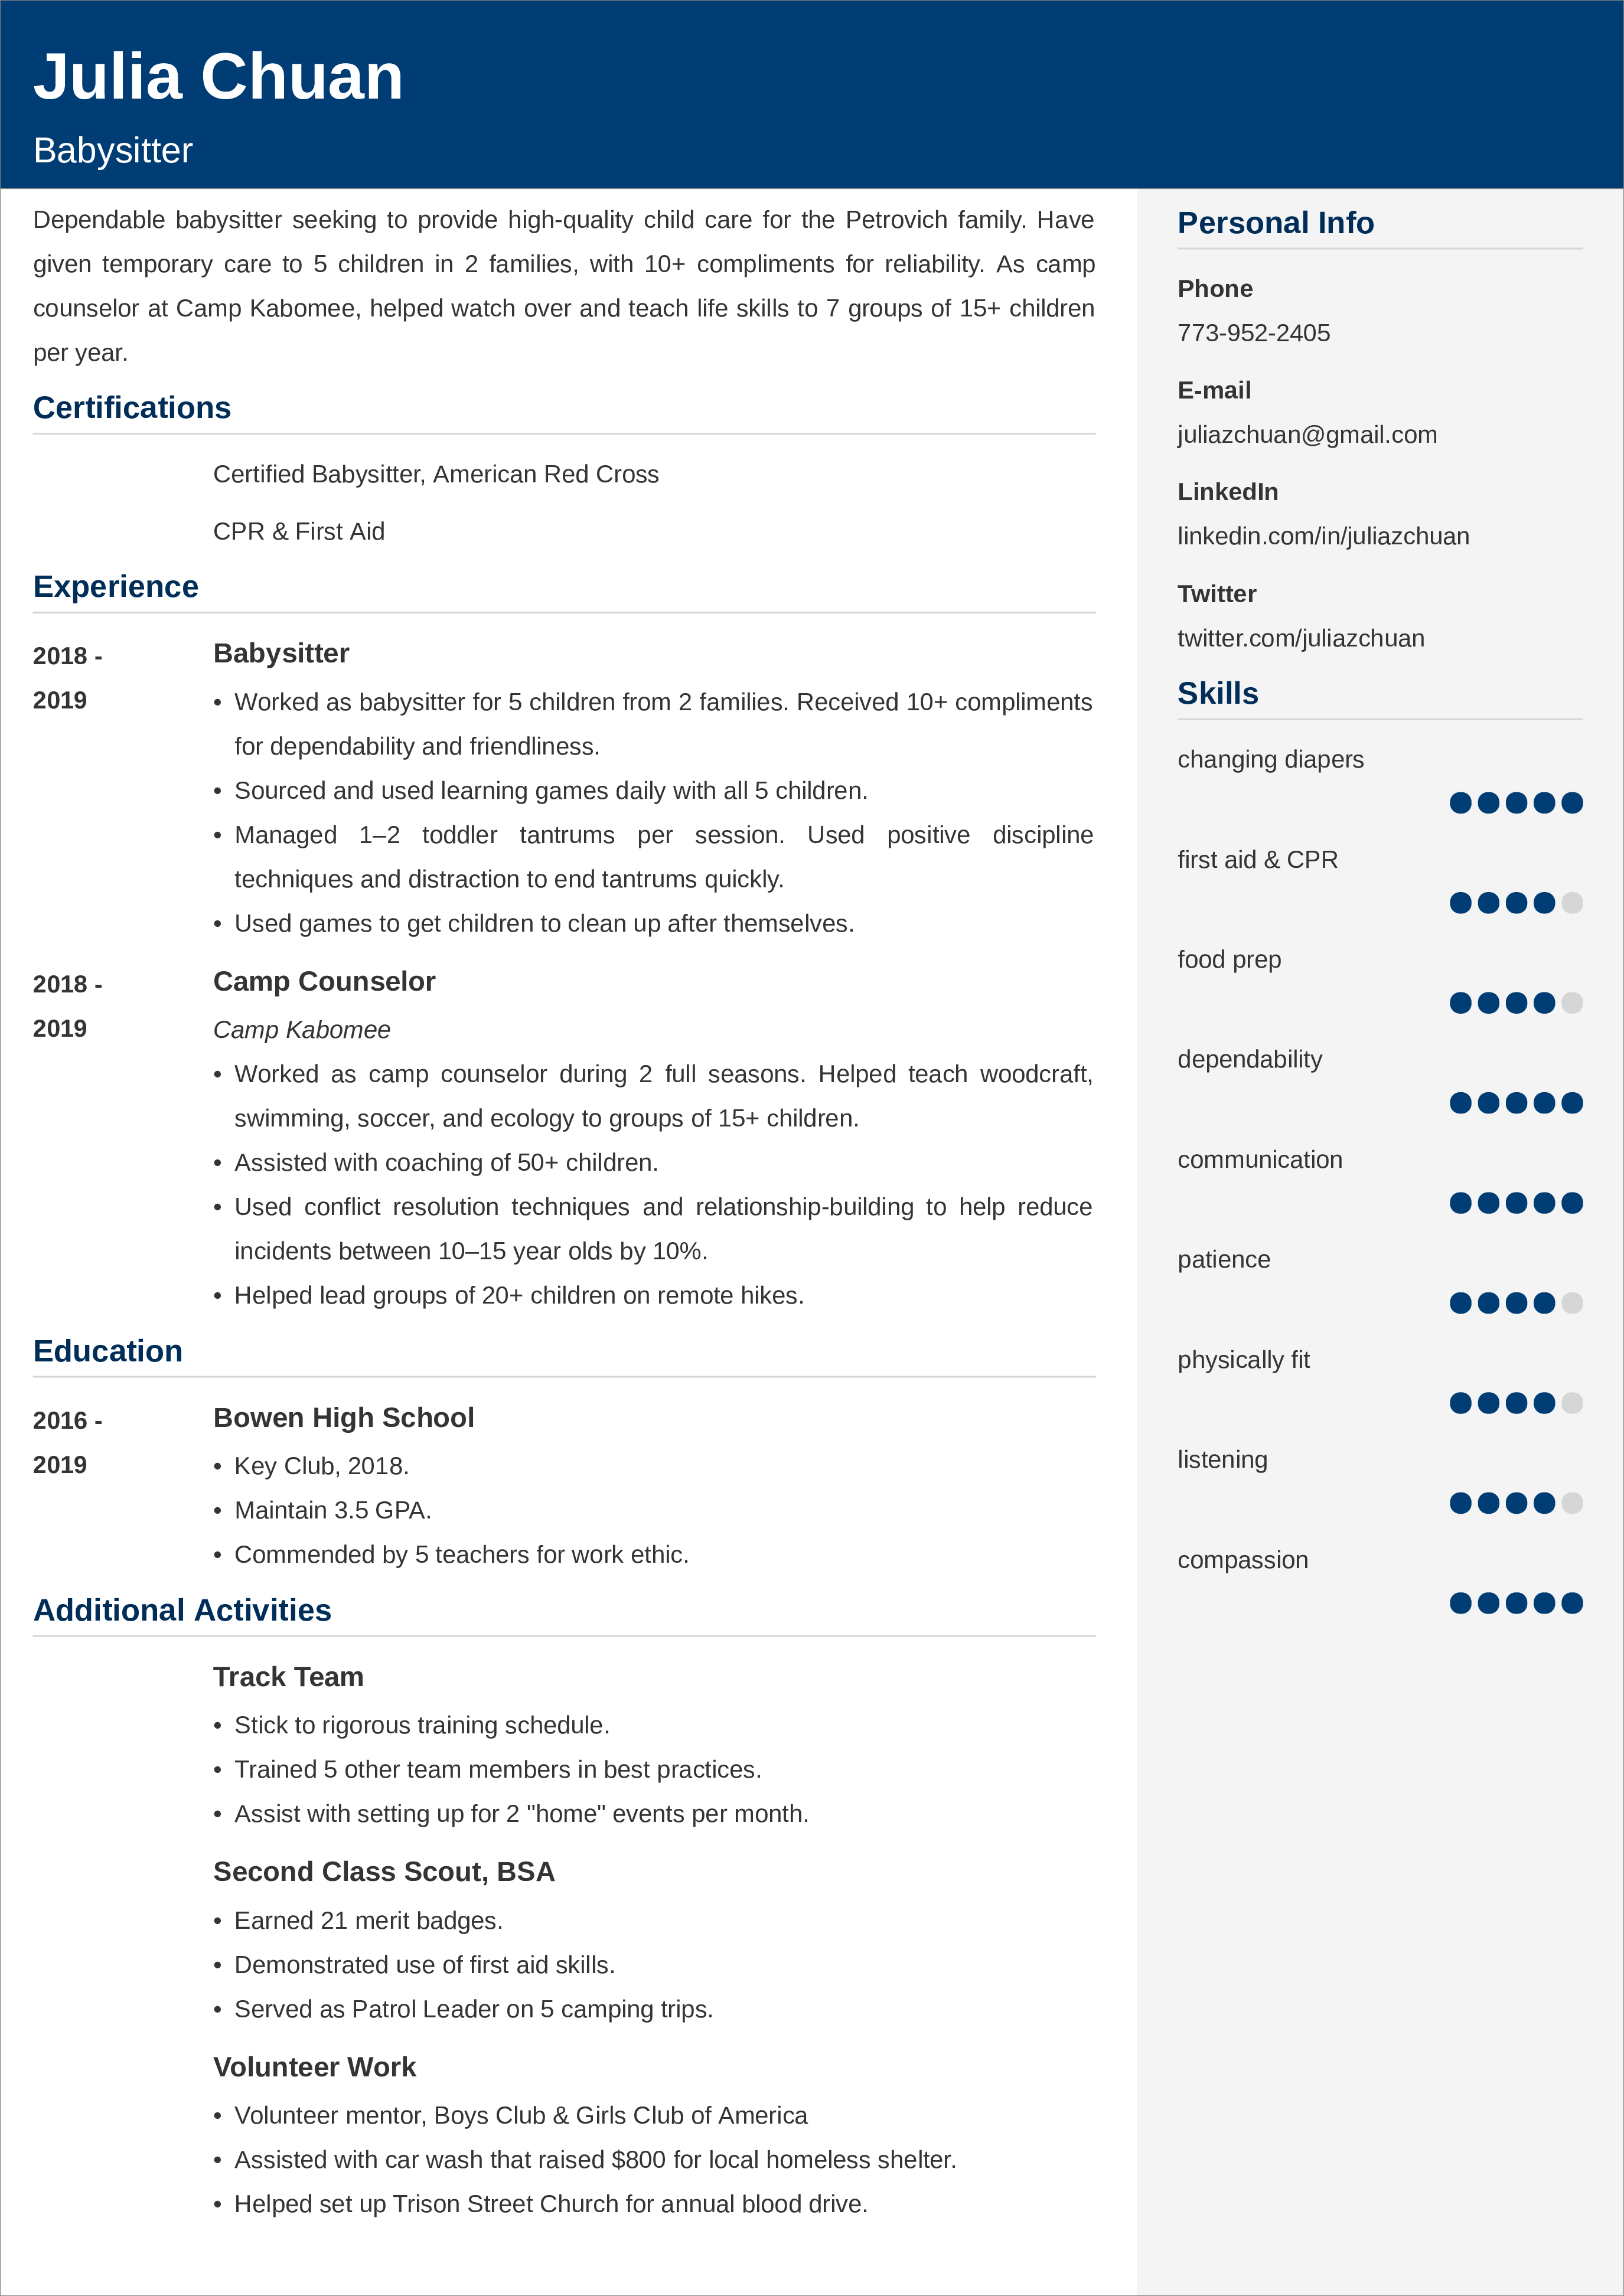 sample CV templates